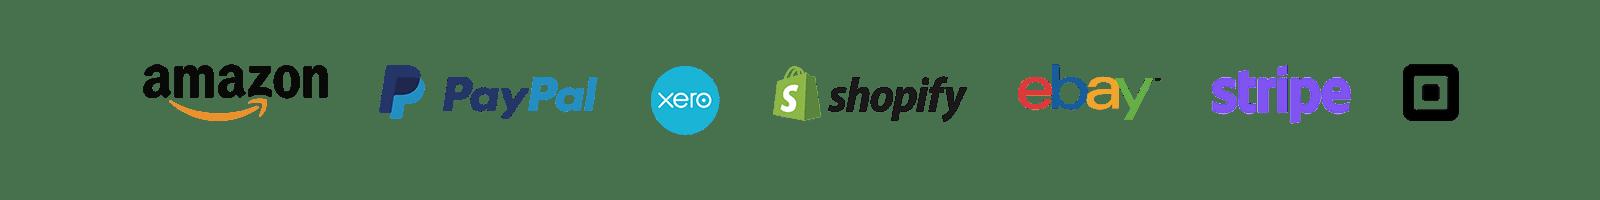 https://www.waoconnect.com/wp-content/uploads/2020/05/Logos-partners.png